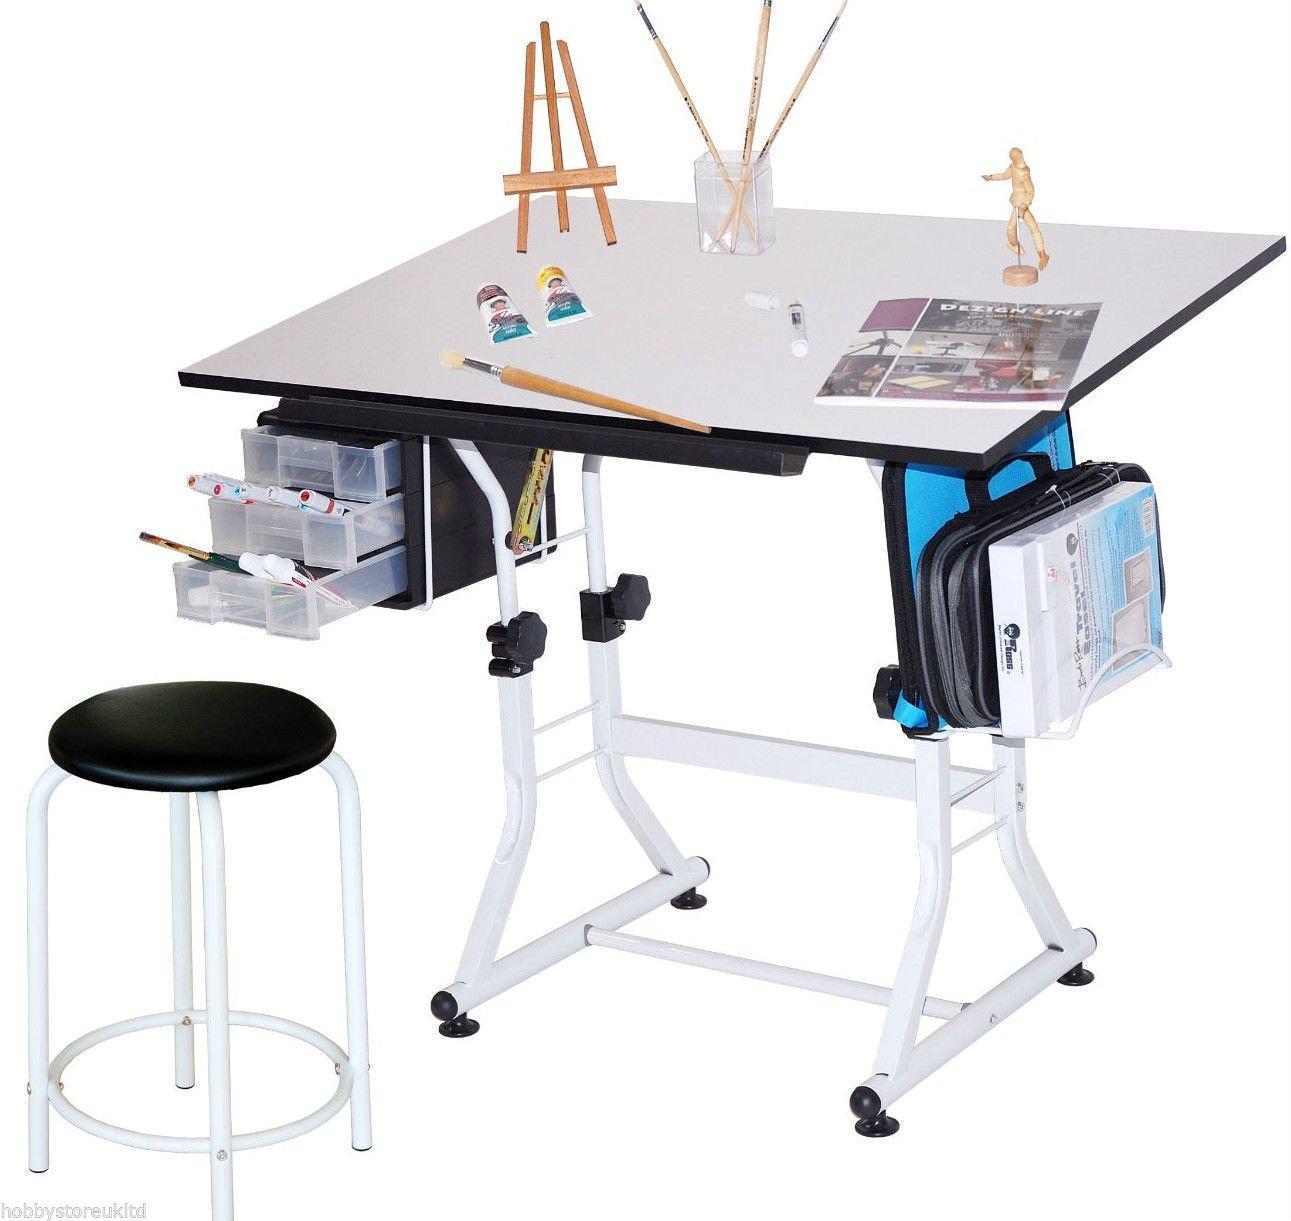 Merveilleux A1 Drawing Board U0026 Stool Adjustable Technical Drawing Board Artist Table  Easel: Amazon.co.uk: Kitchen U0026 Home